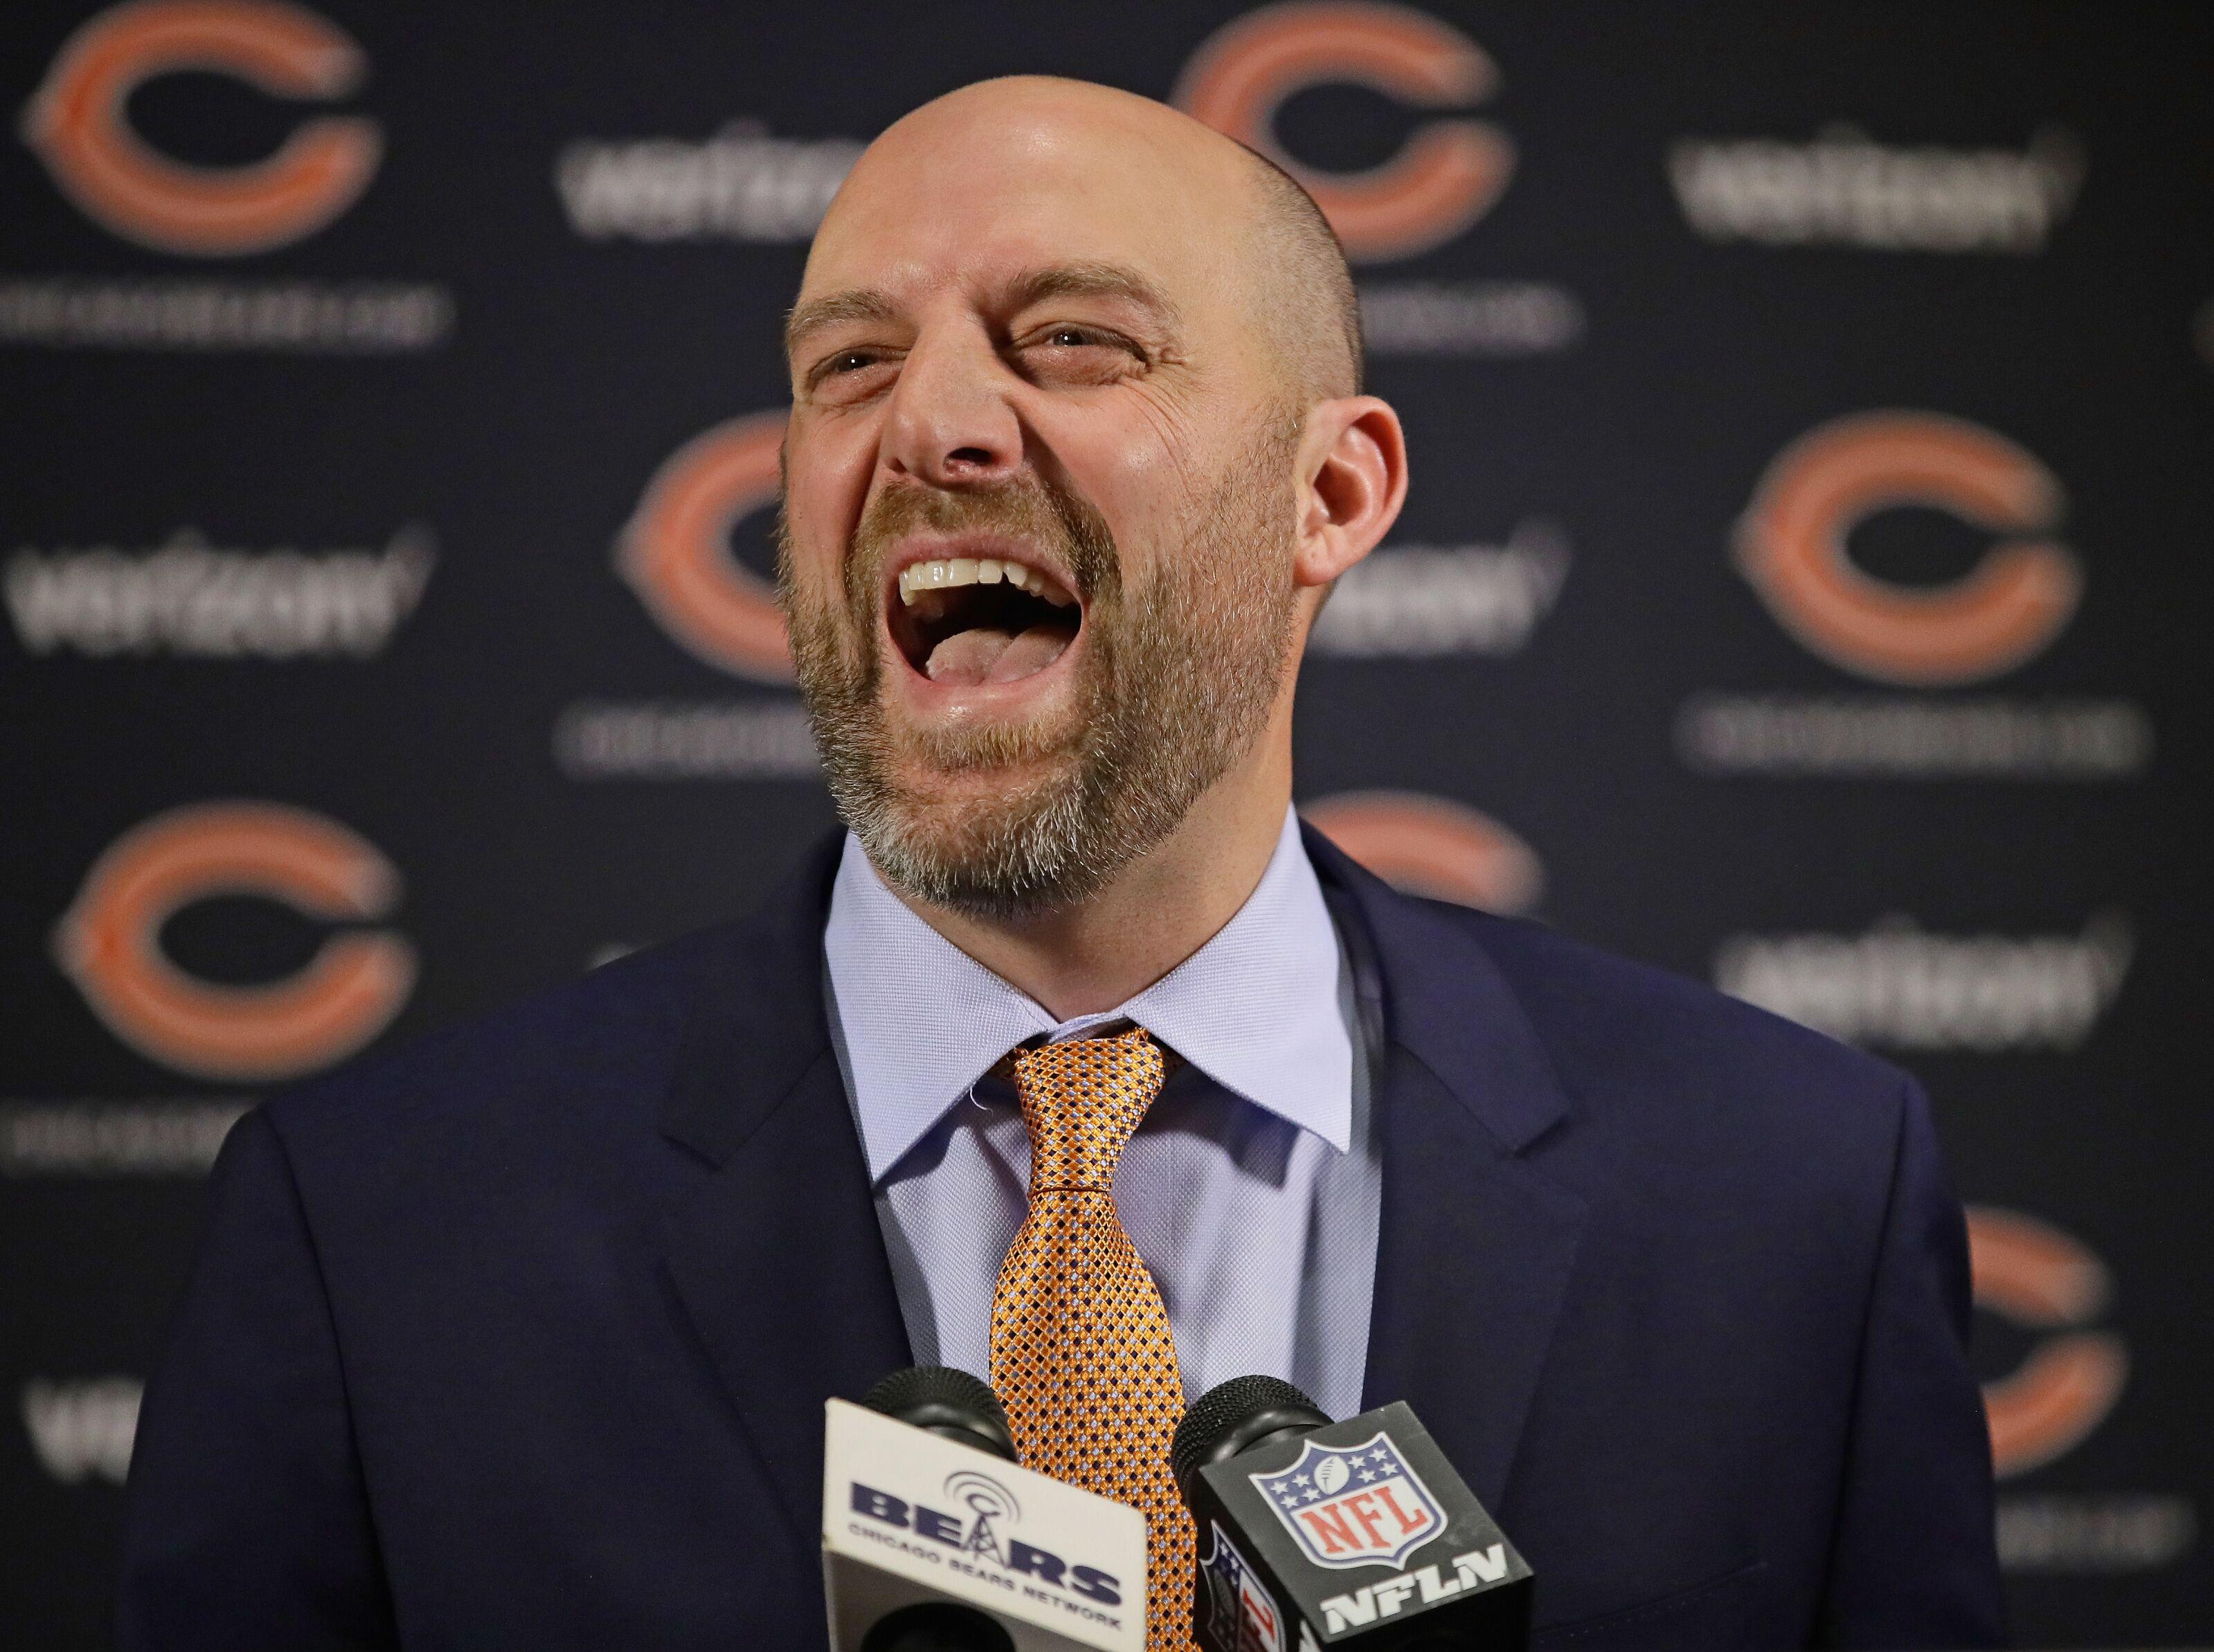 Chicago Bears: Matt Nagy embracing the pain of losing